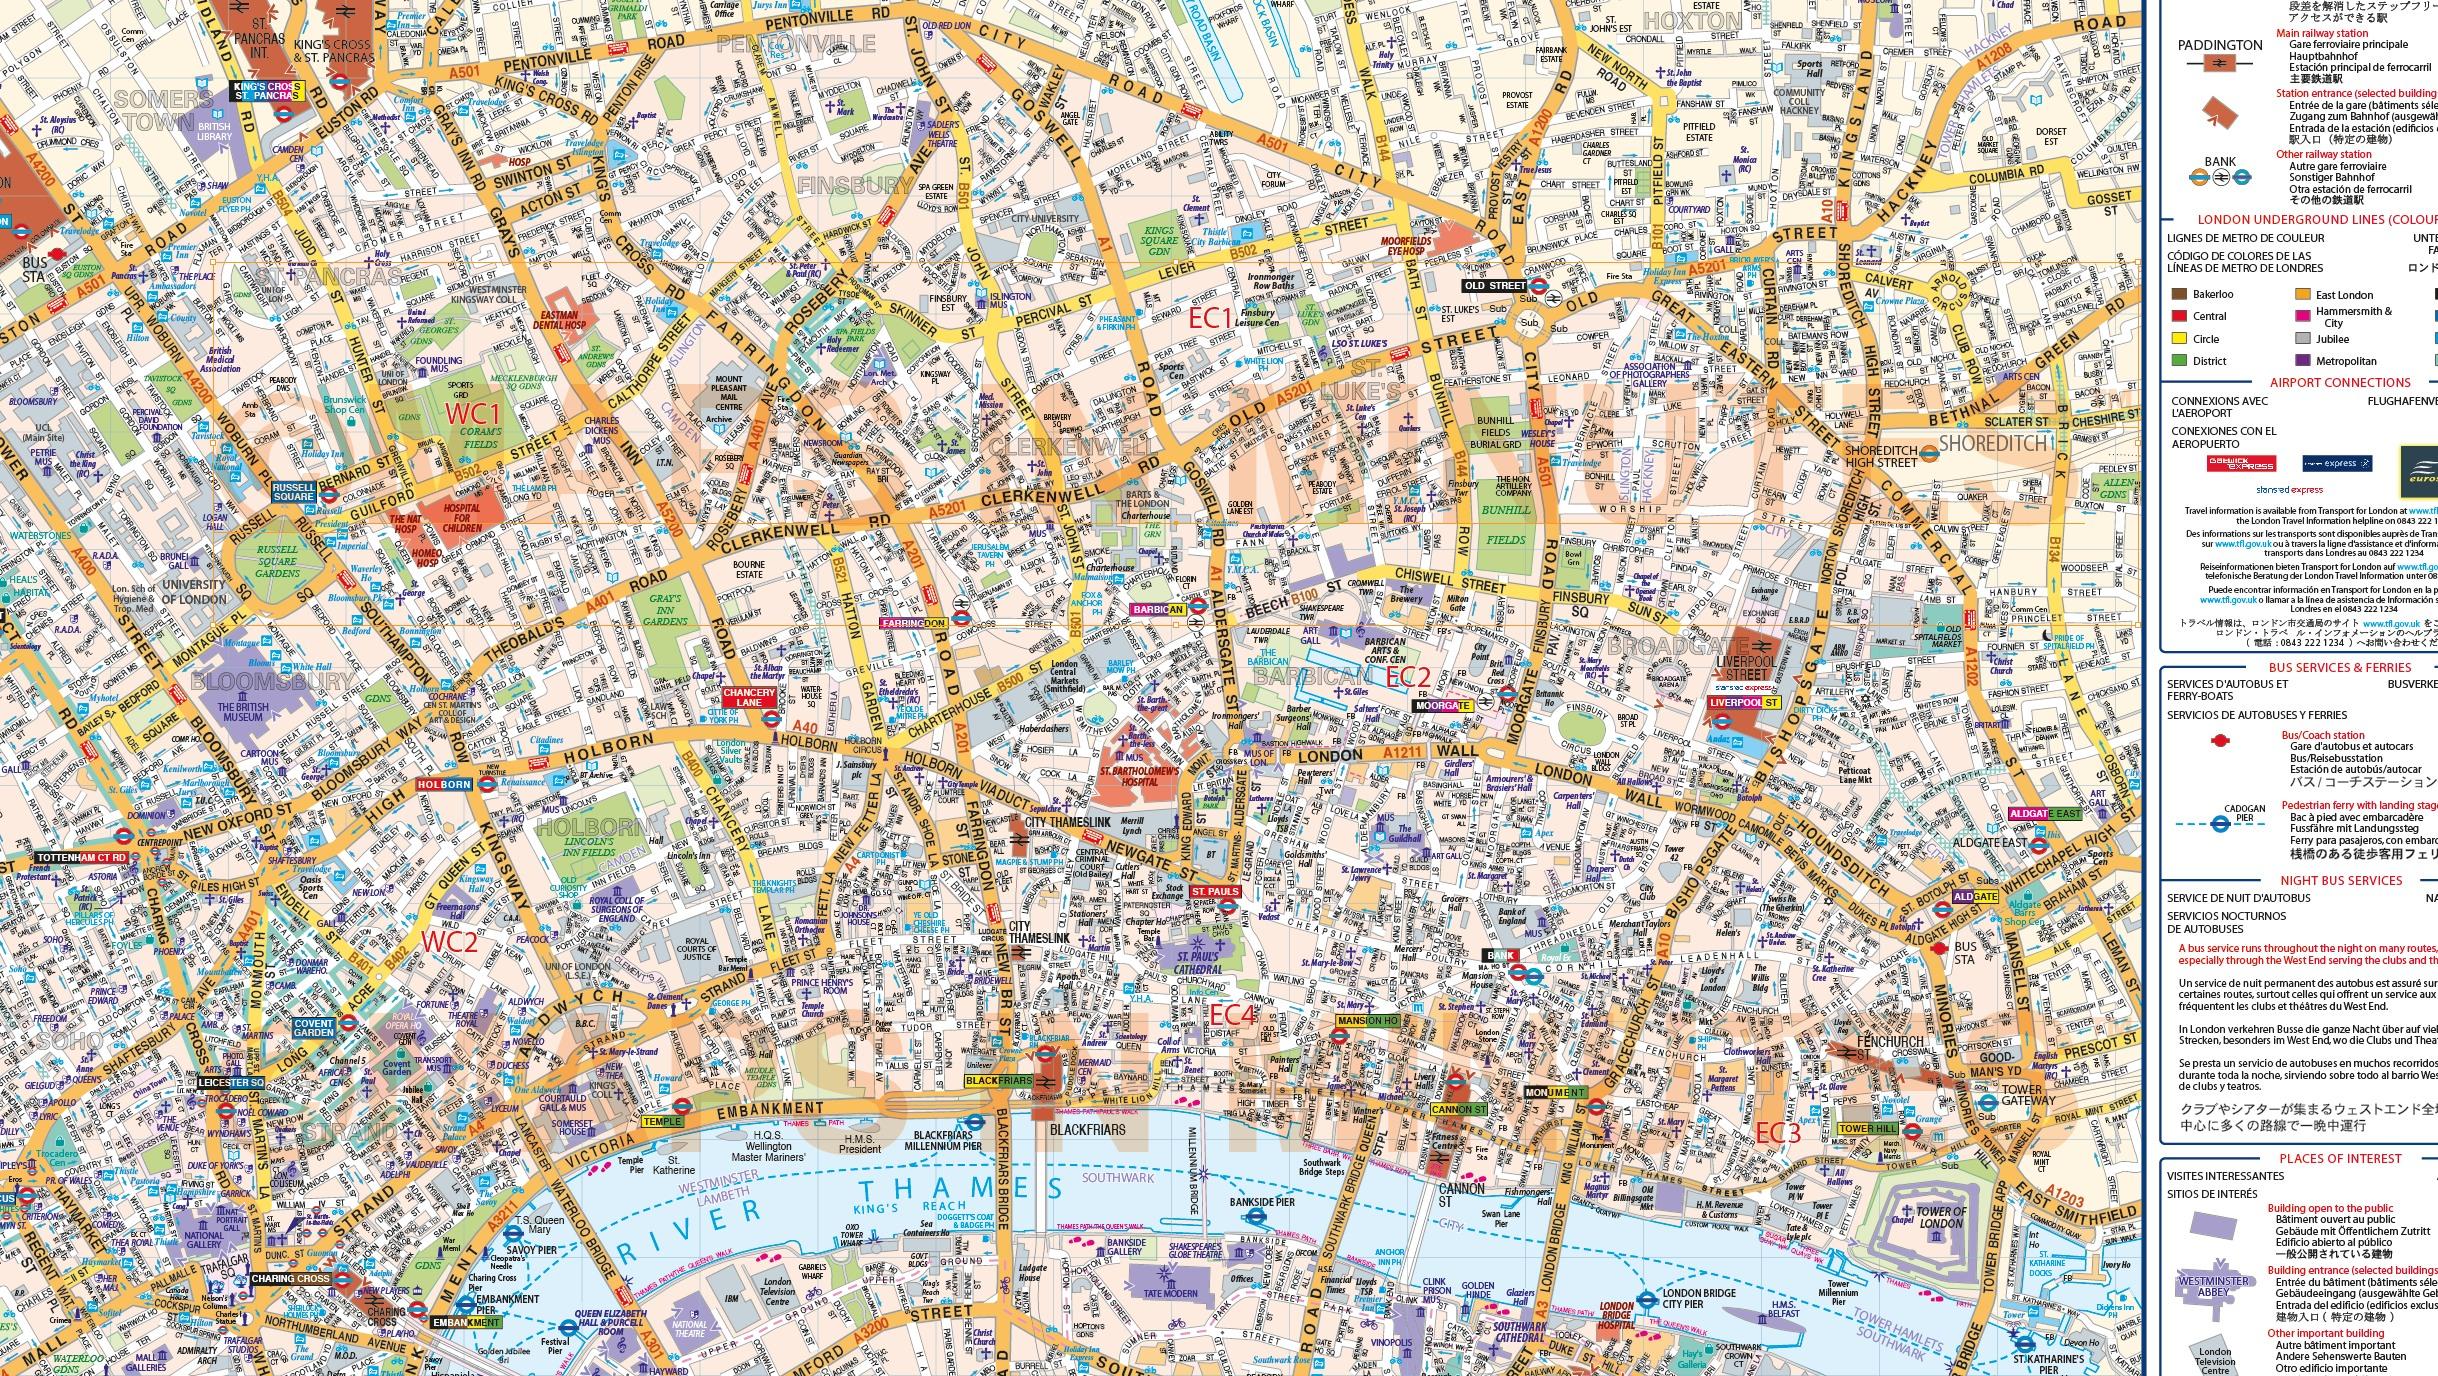 London Atlas Map.Vinyl Central London Street Map Large Size 1 2m D X 1 67m W